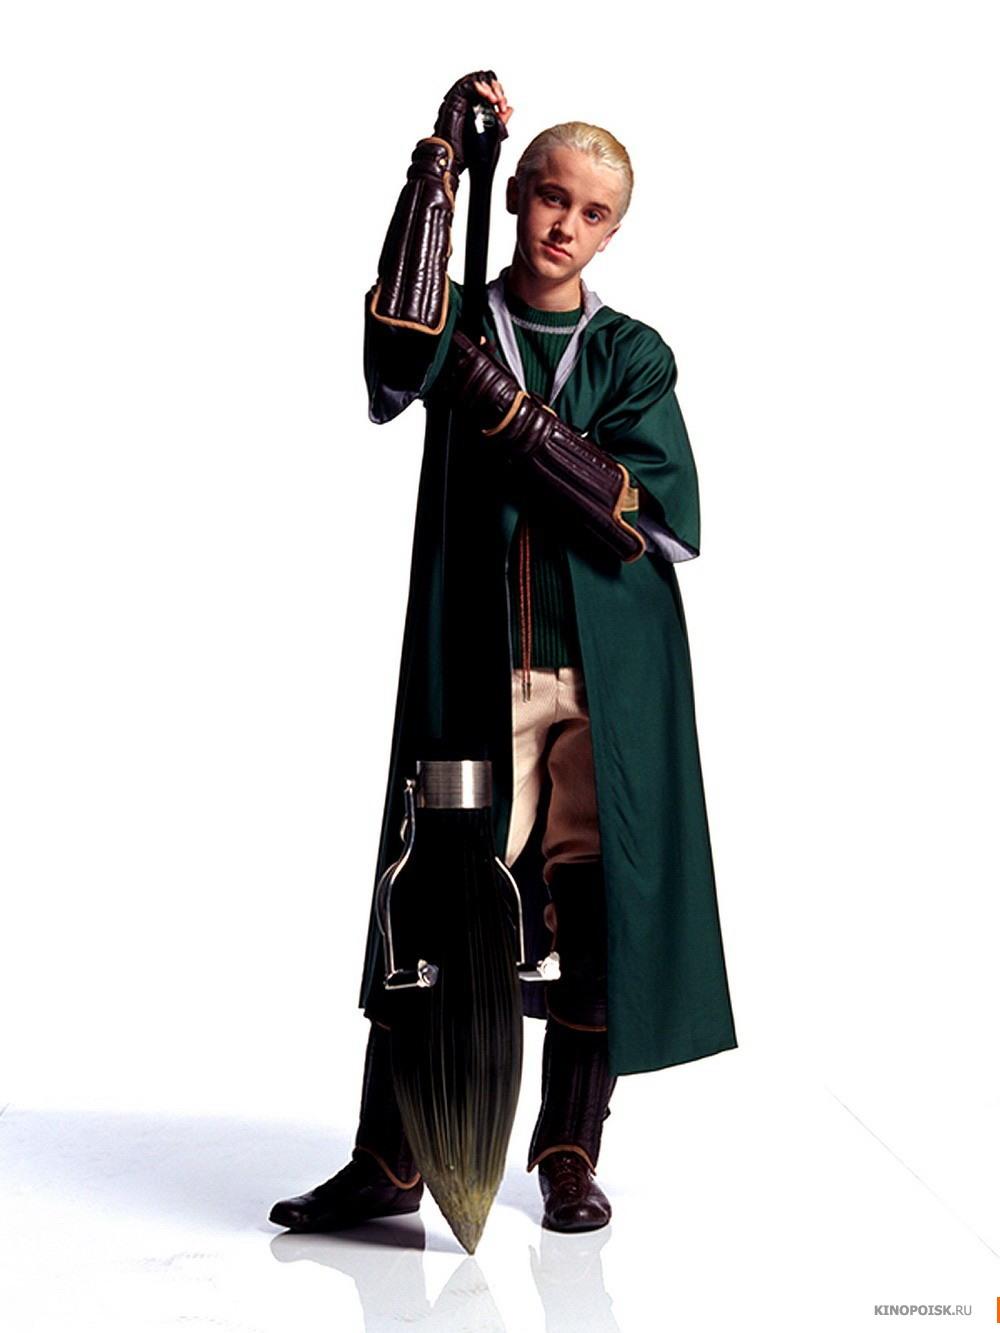 Фото: Гарри Поттер и Тайная комната / Промо-материалы ...